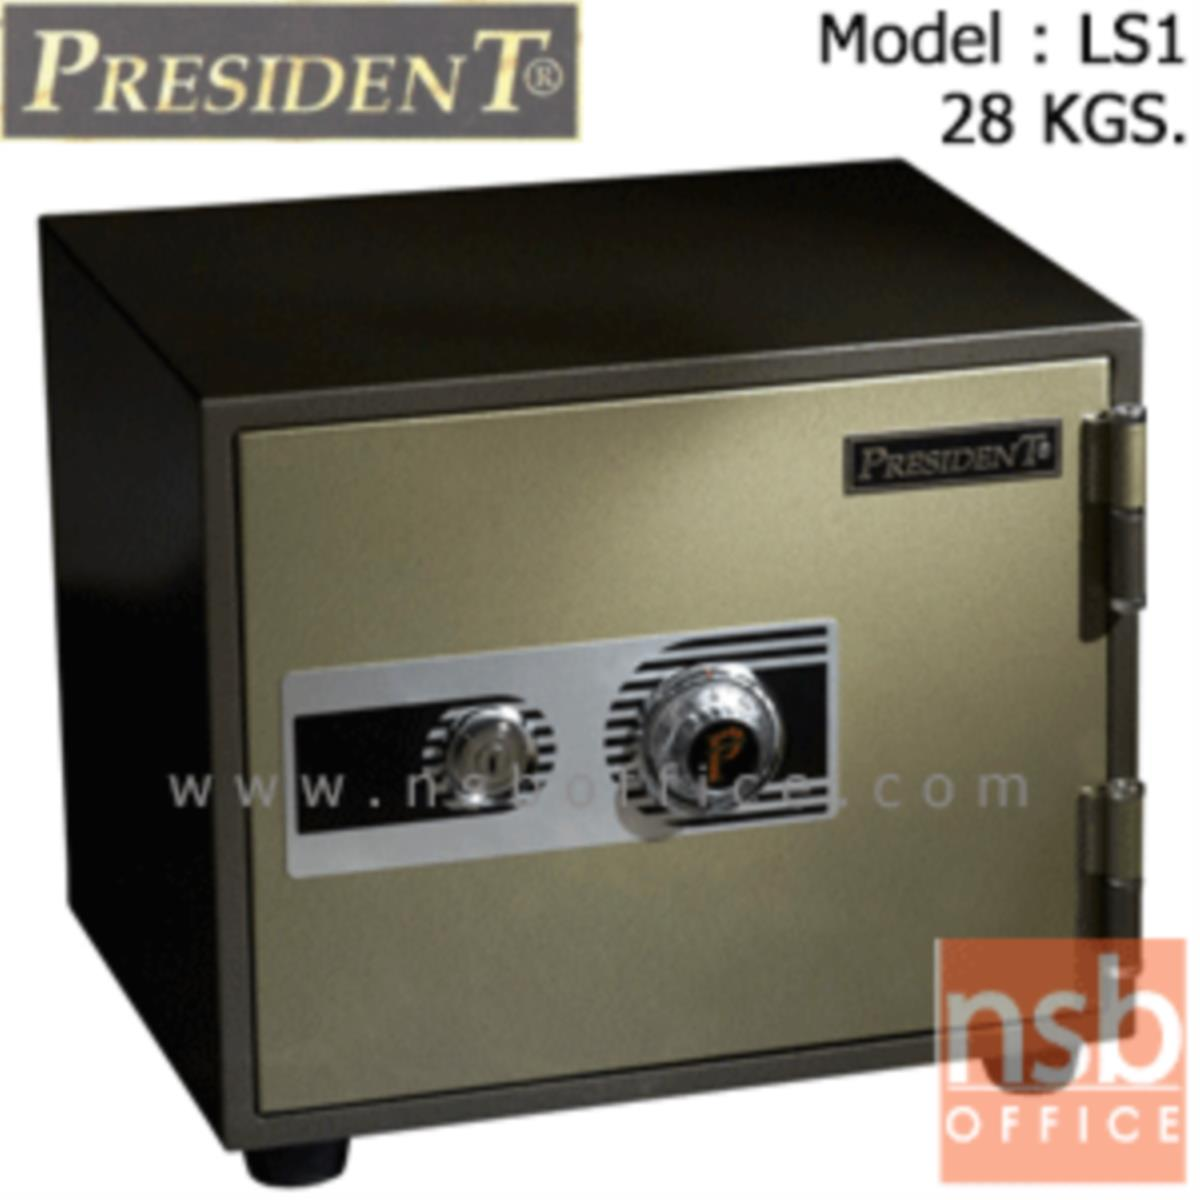 F05A007:ตู้เซฟนิรภัยชนิดหมุน 28 กก. รุ่น PRESIDENT-LS1 มี 1 กุญแจ 1 รหัส (รหัสใช้หมุนหน้าตู้)